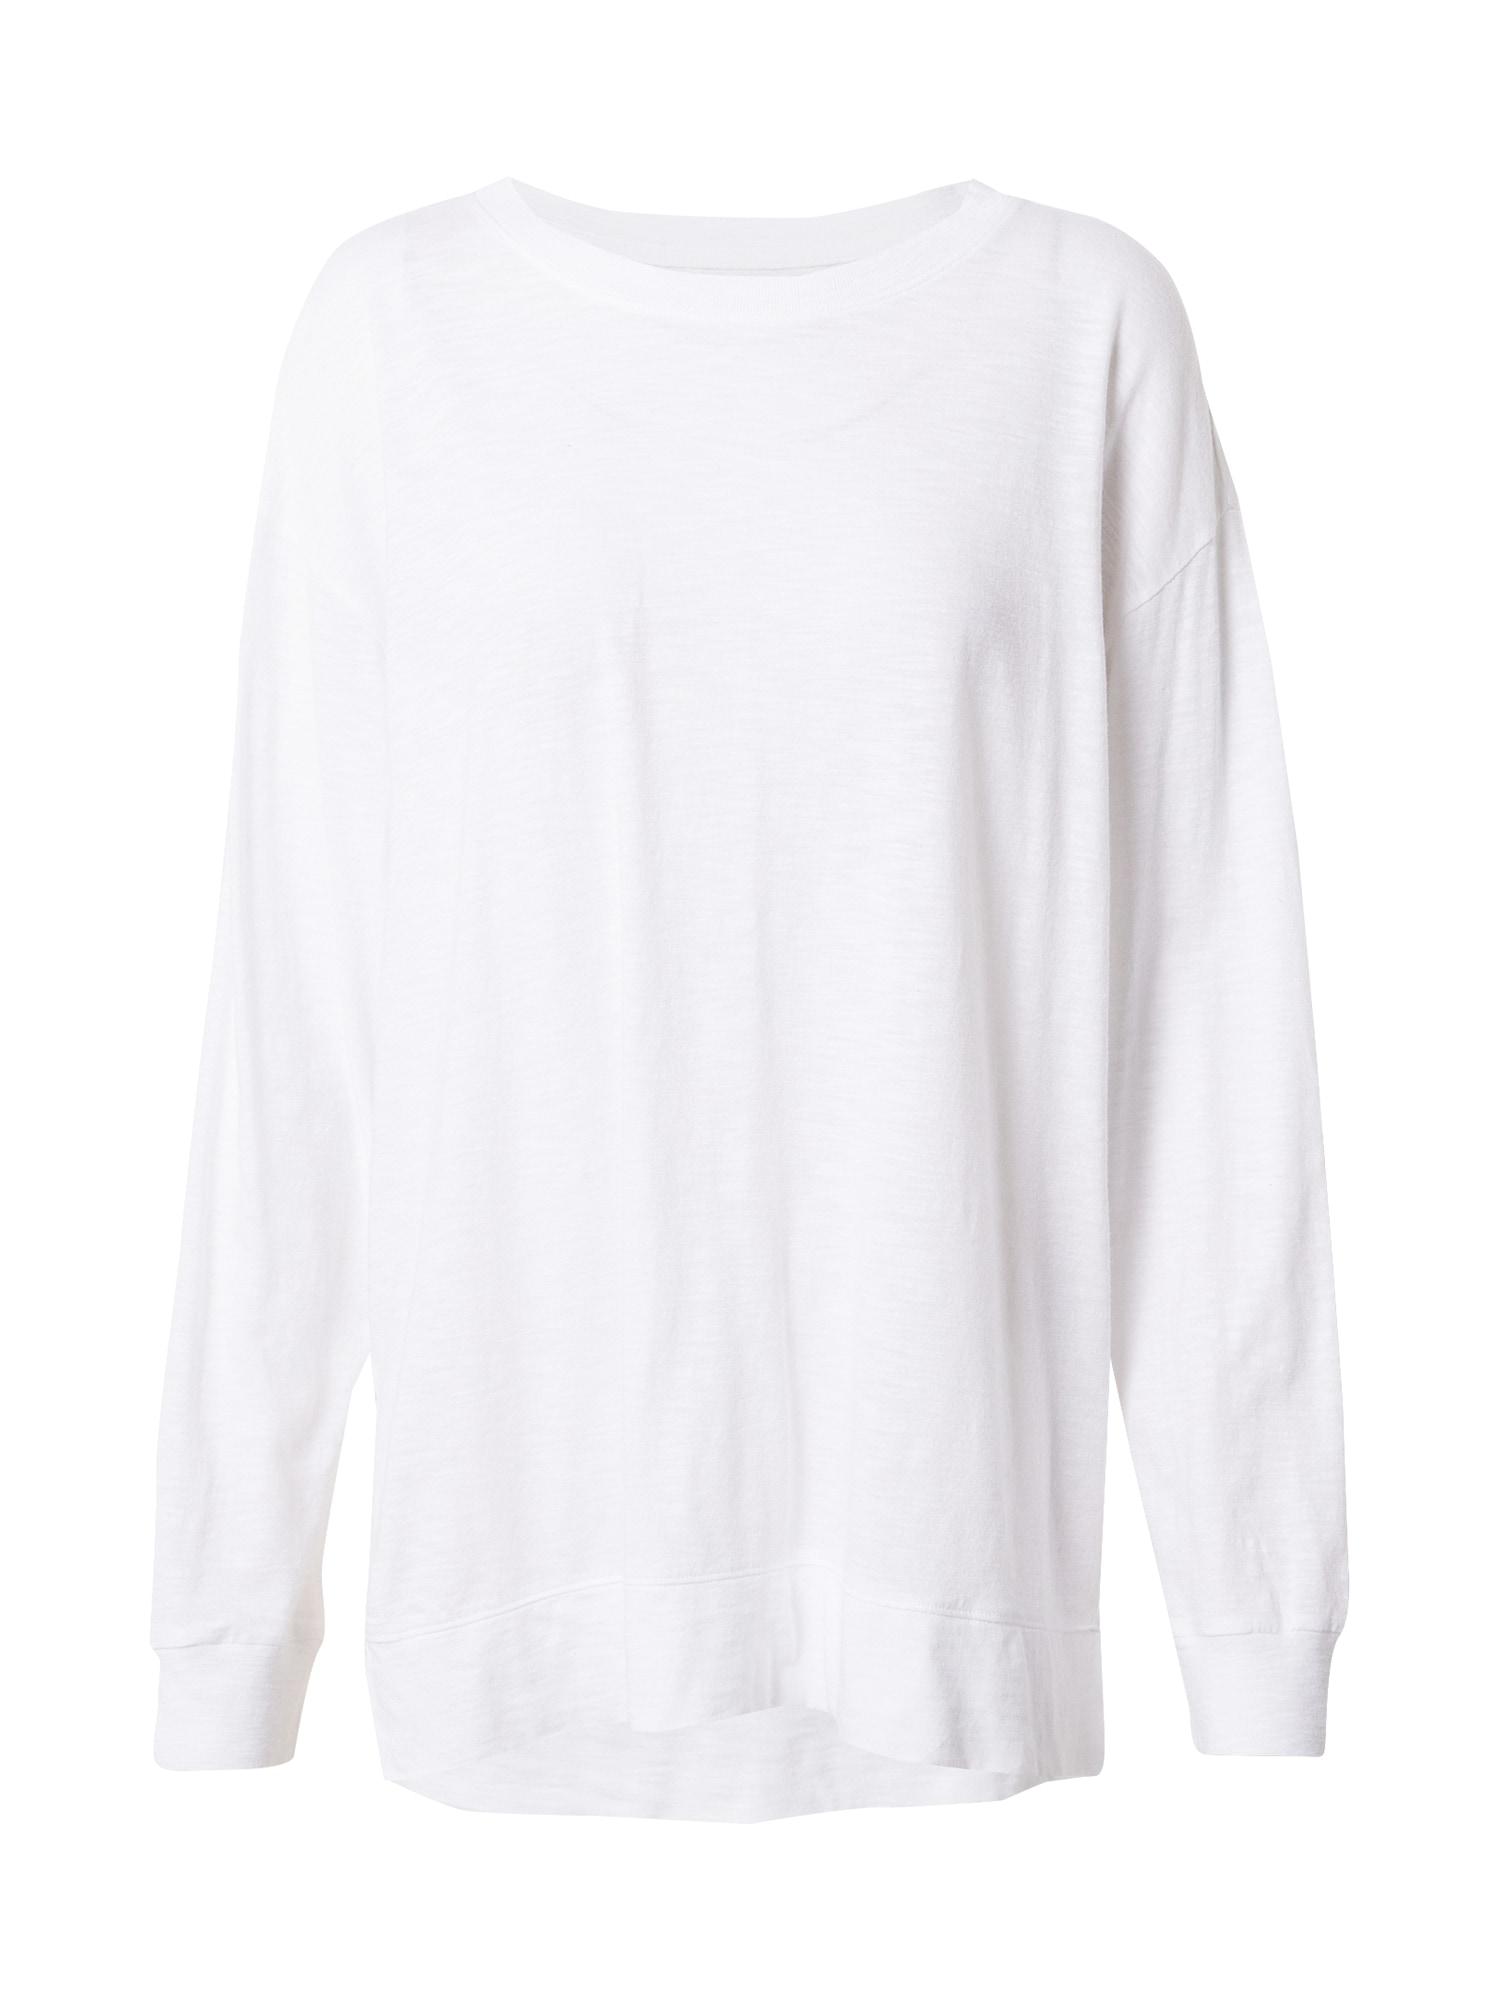 Abercrombie & Fitch Marškinėliai margai balta